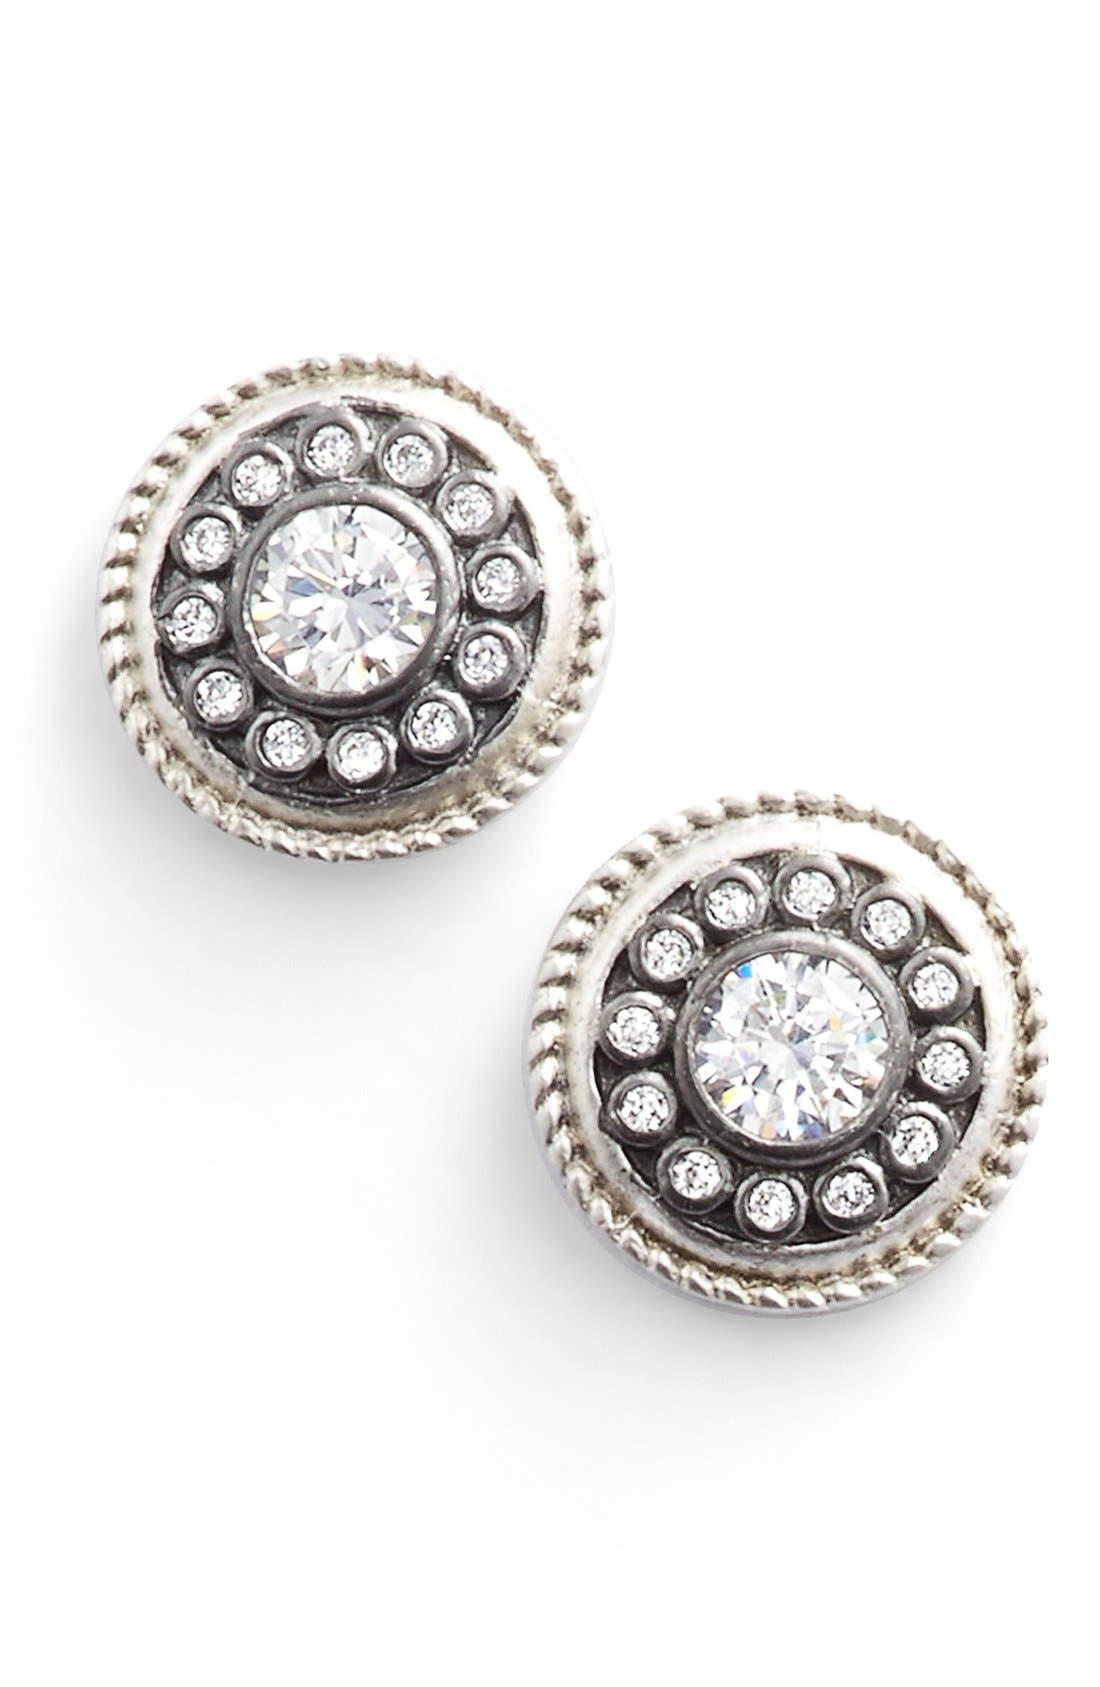 'Nautical Button' Stud Earrings,                         Main,                         color, Silver/ Gunmetal/ Clear